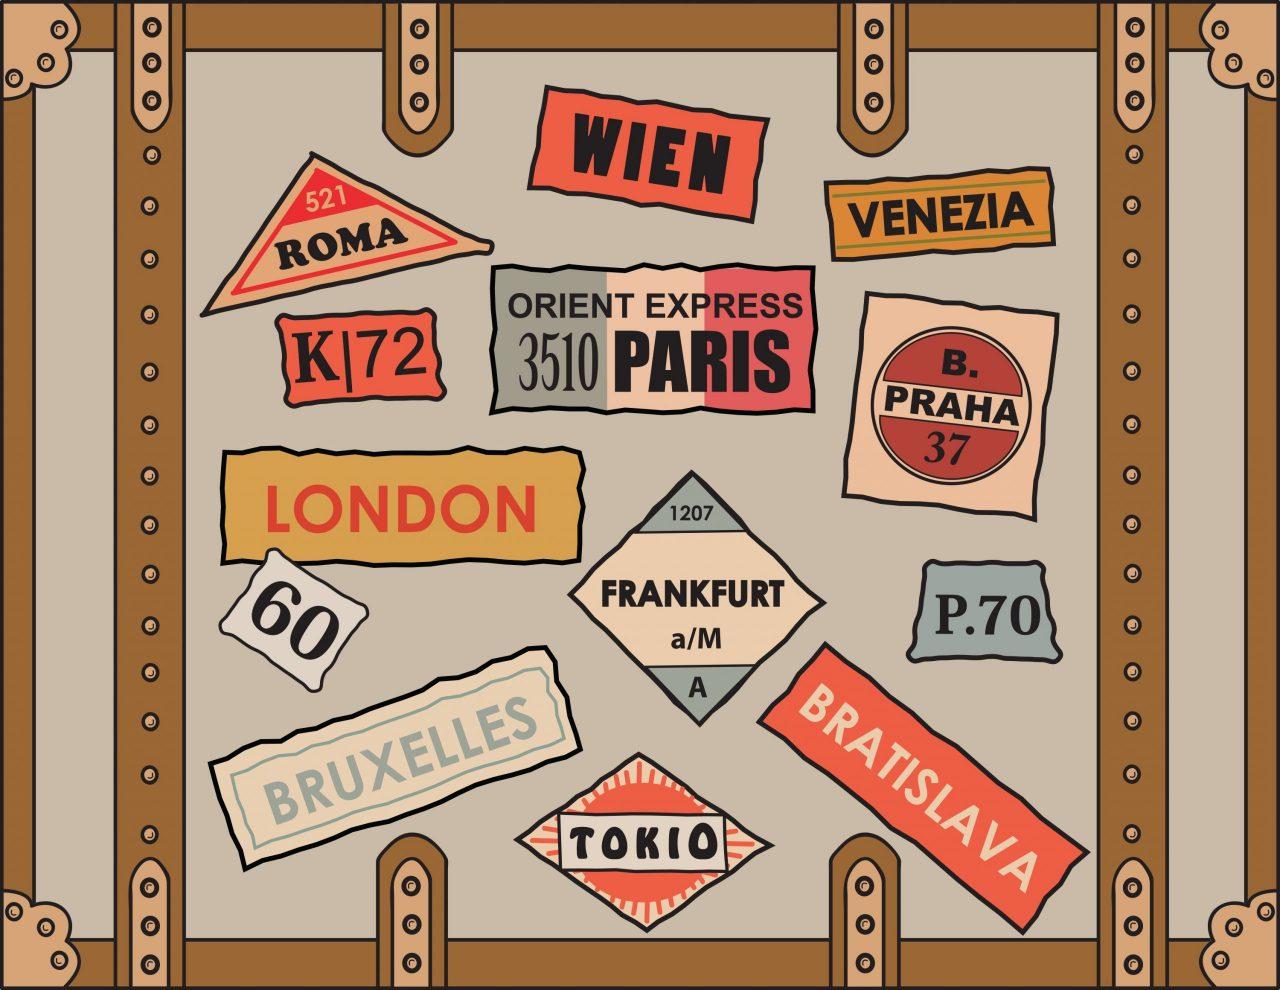 vintage-travel-stickers-on-old-luggage_fyGj44OO_L